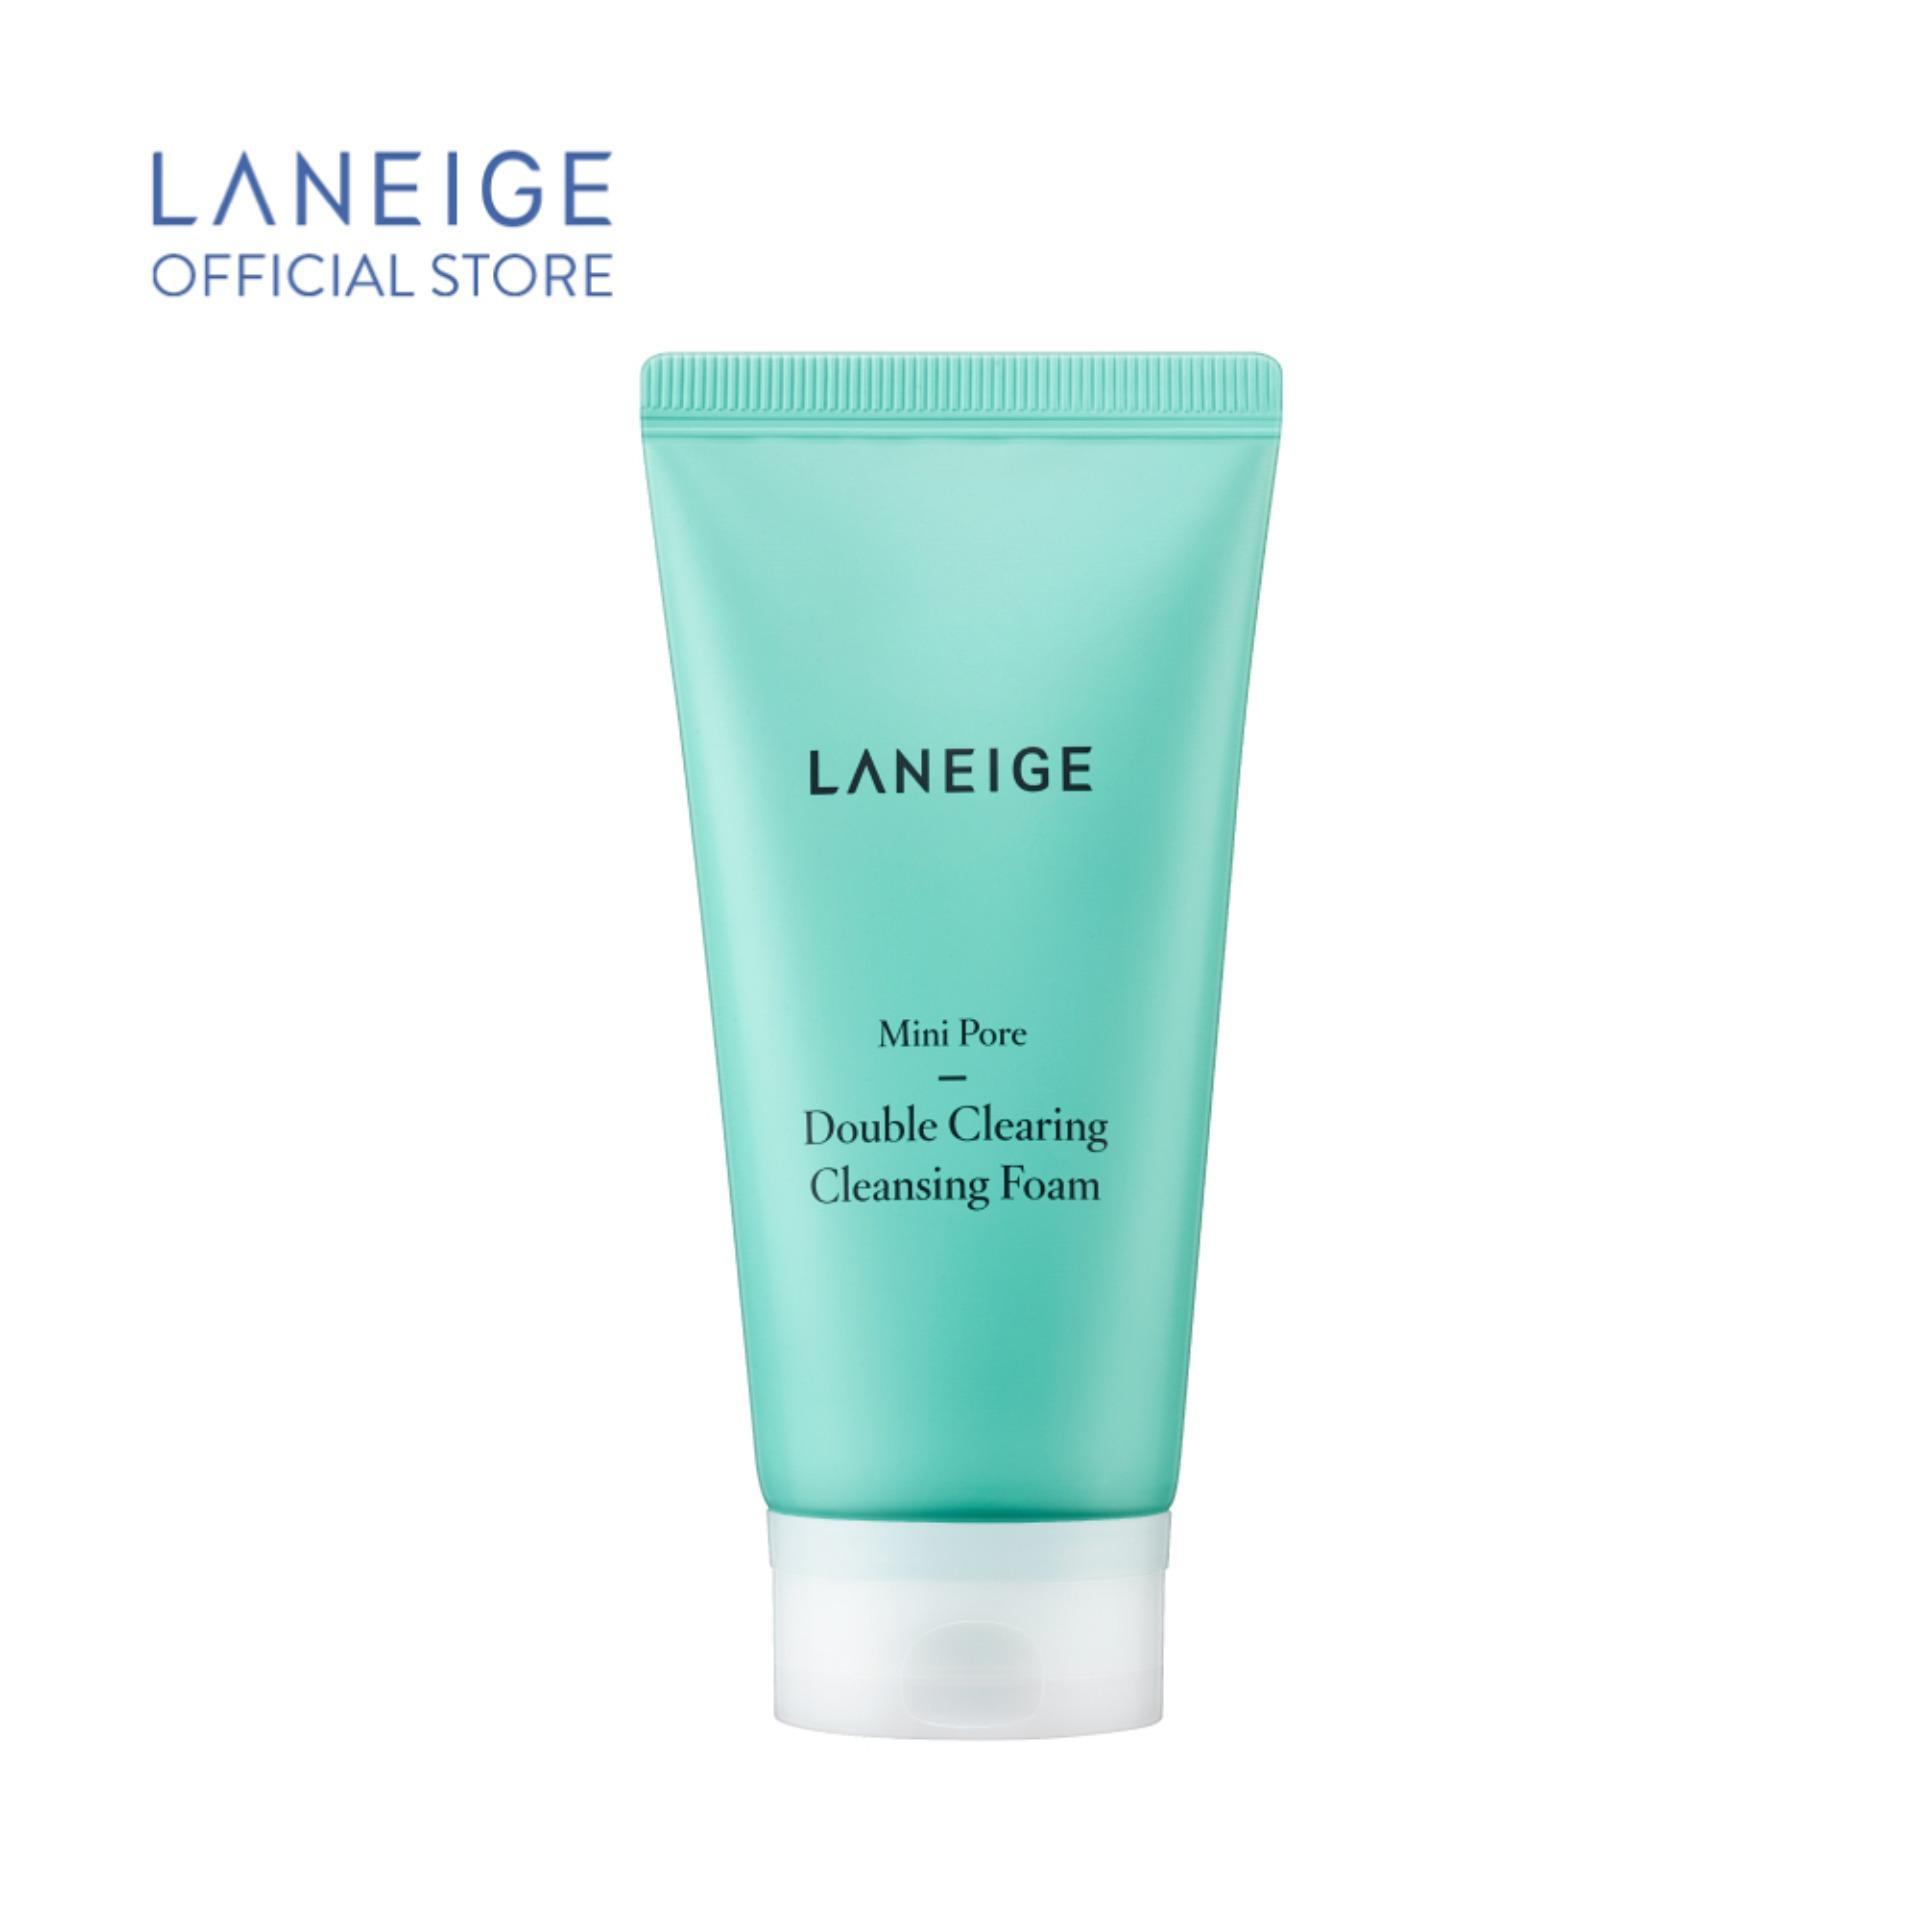 Sữa rửa mặt làm sạch sâu lỗ chân lông Laneige Mini Pore Double Clearing Cleansing Foam 150ml